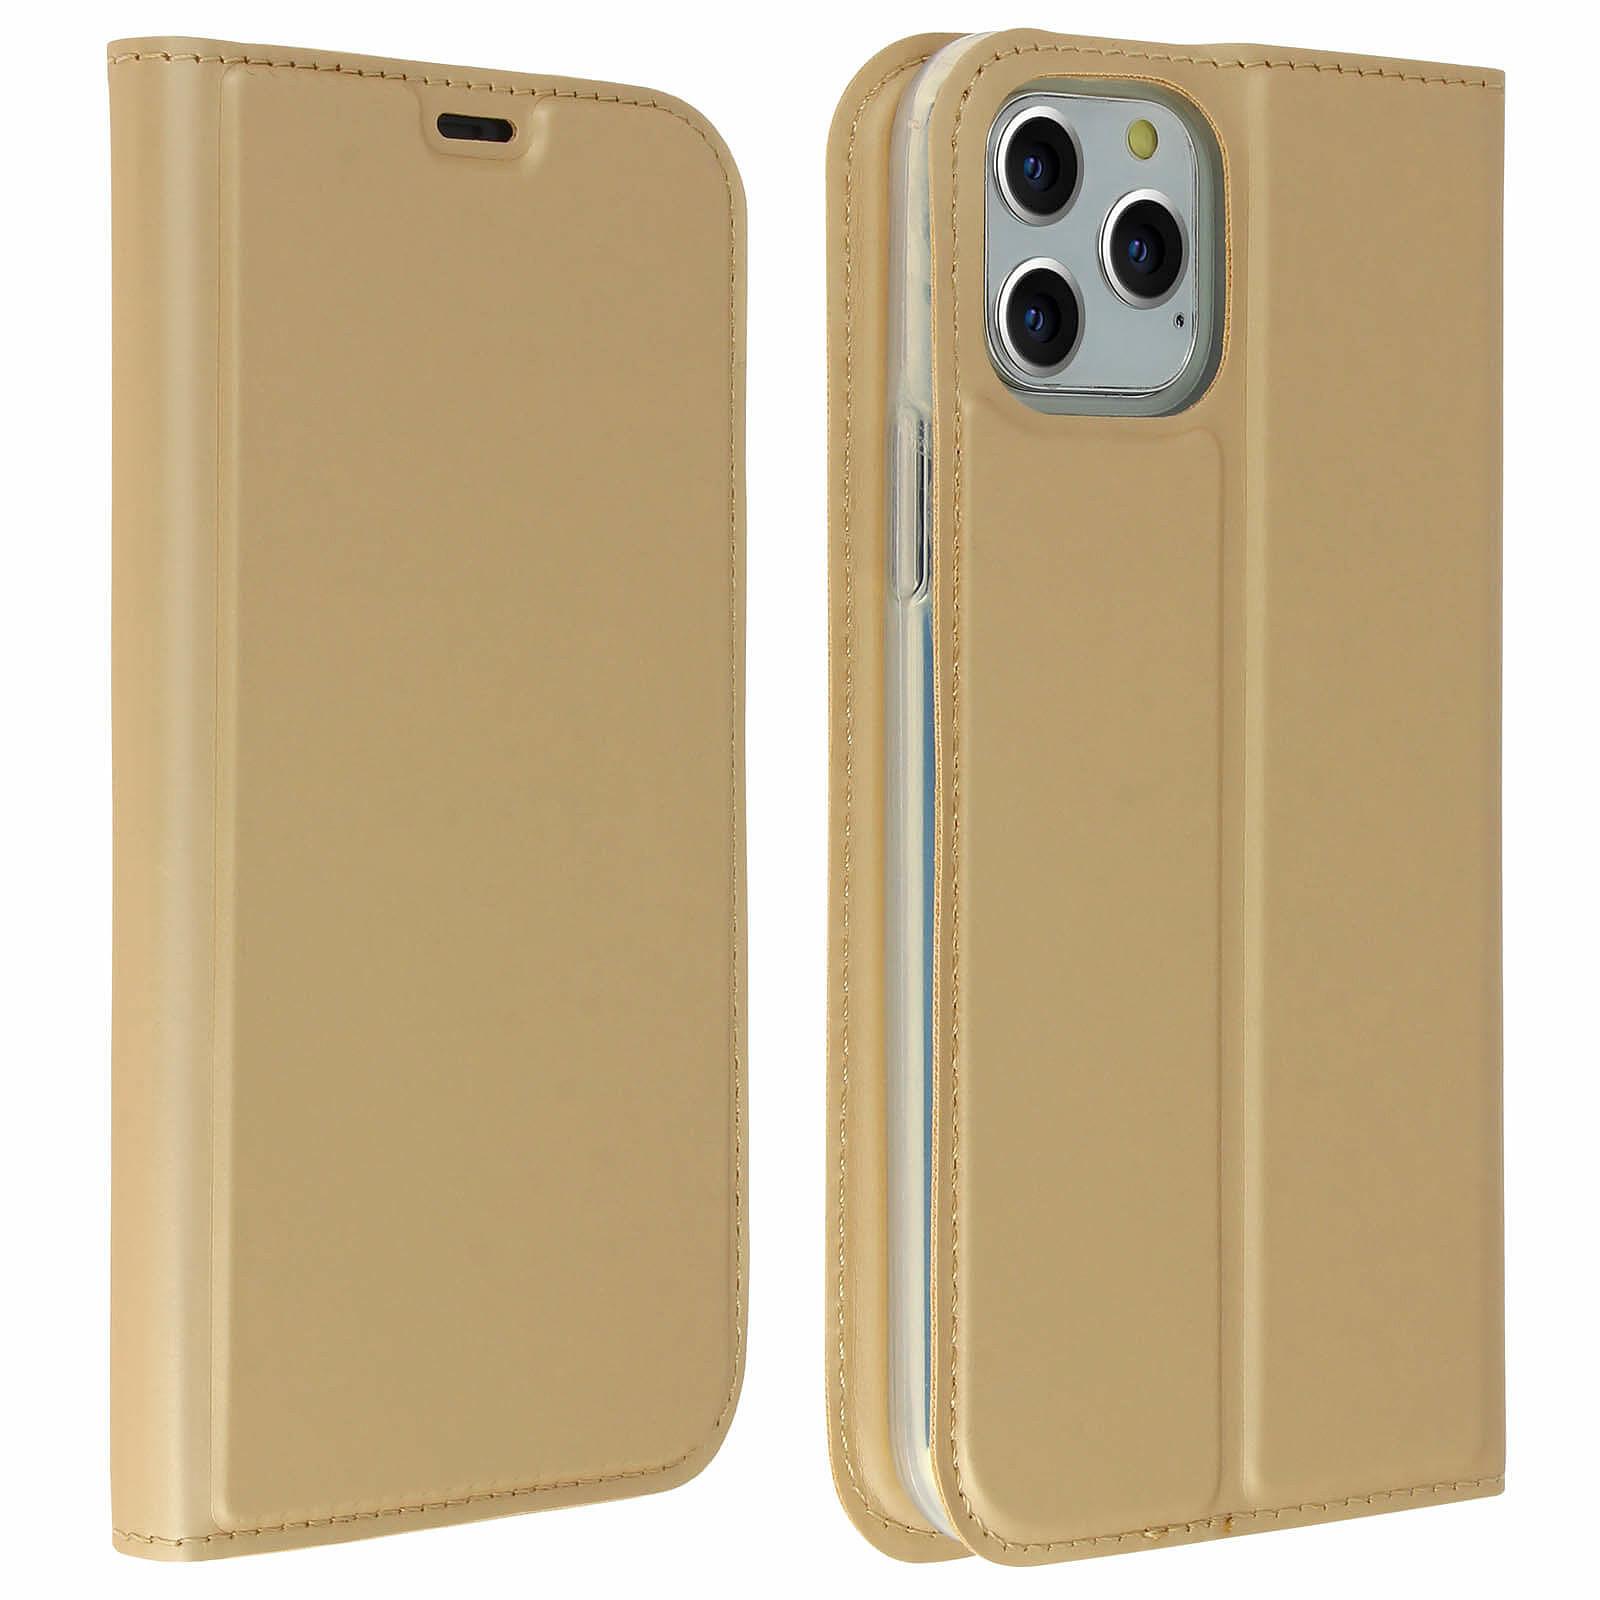 Avizar Etui folio Dorée Éco-cuir pour Apple iPhone 11 Pro